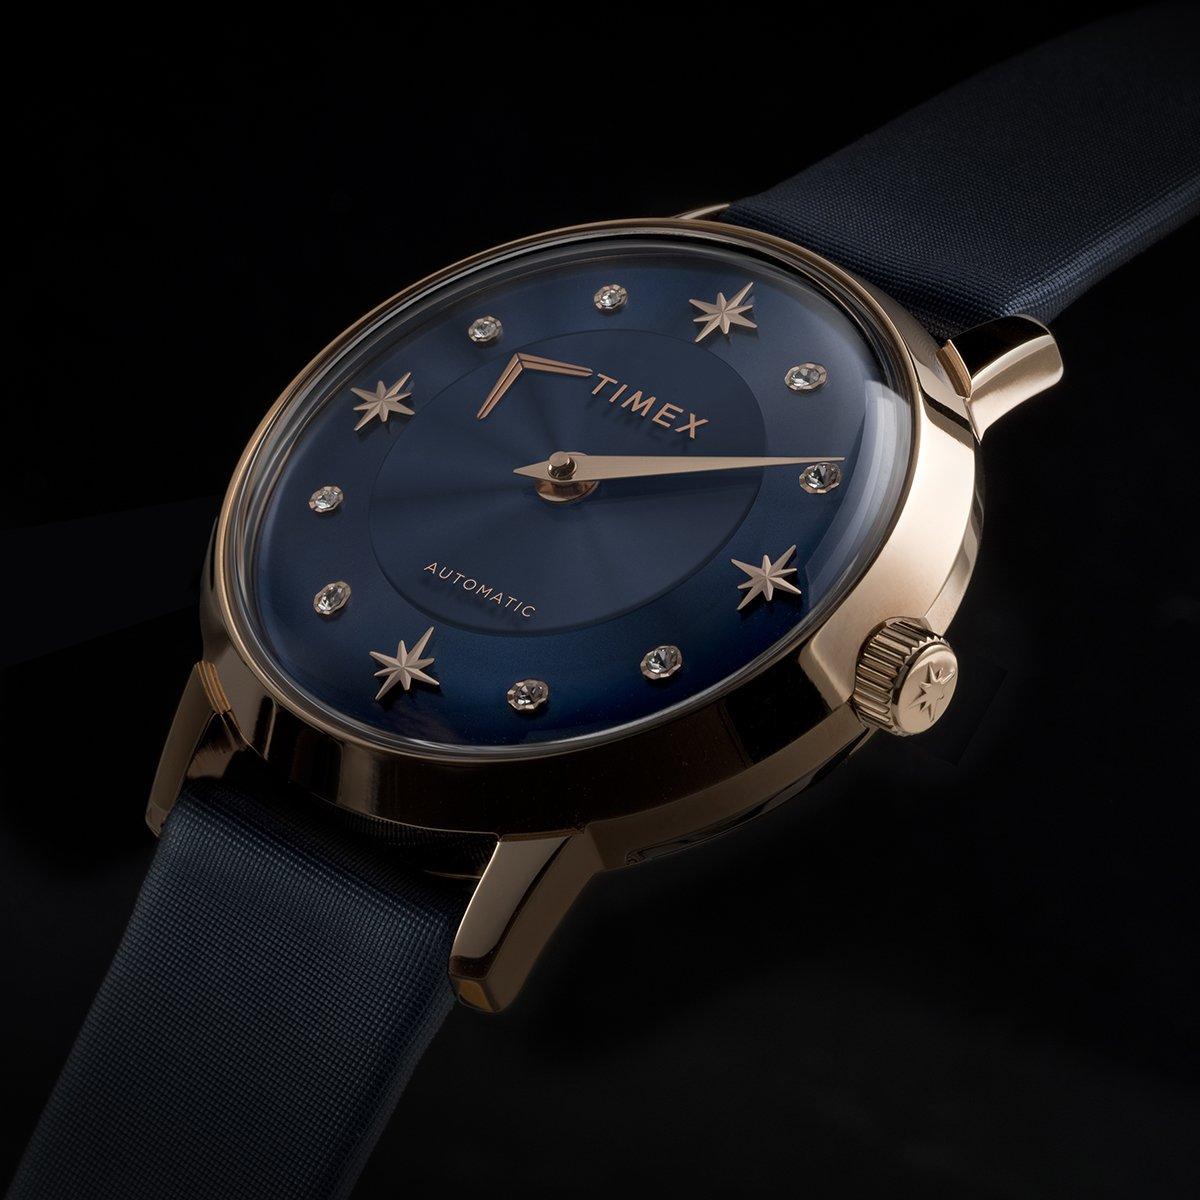 Granatowa tarcza zegarka Timex Crystal Opulence TW2T86100